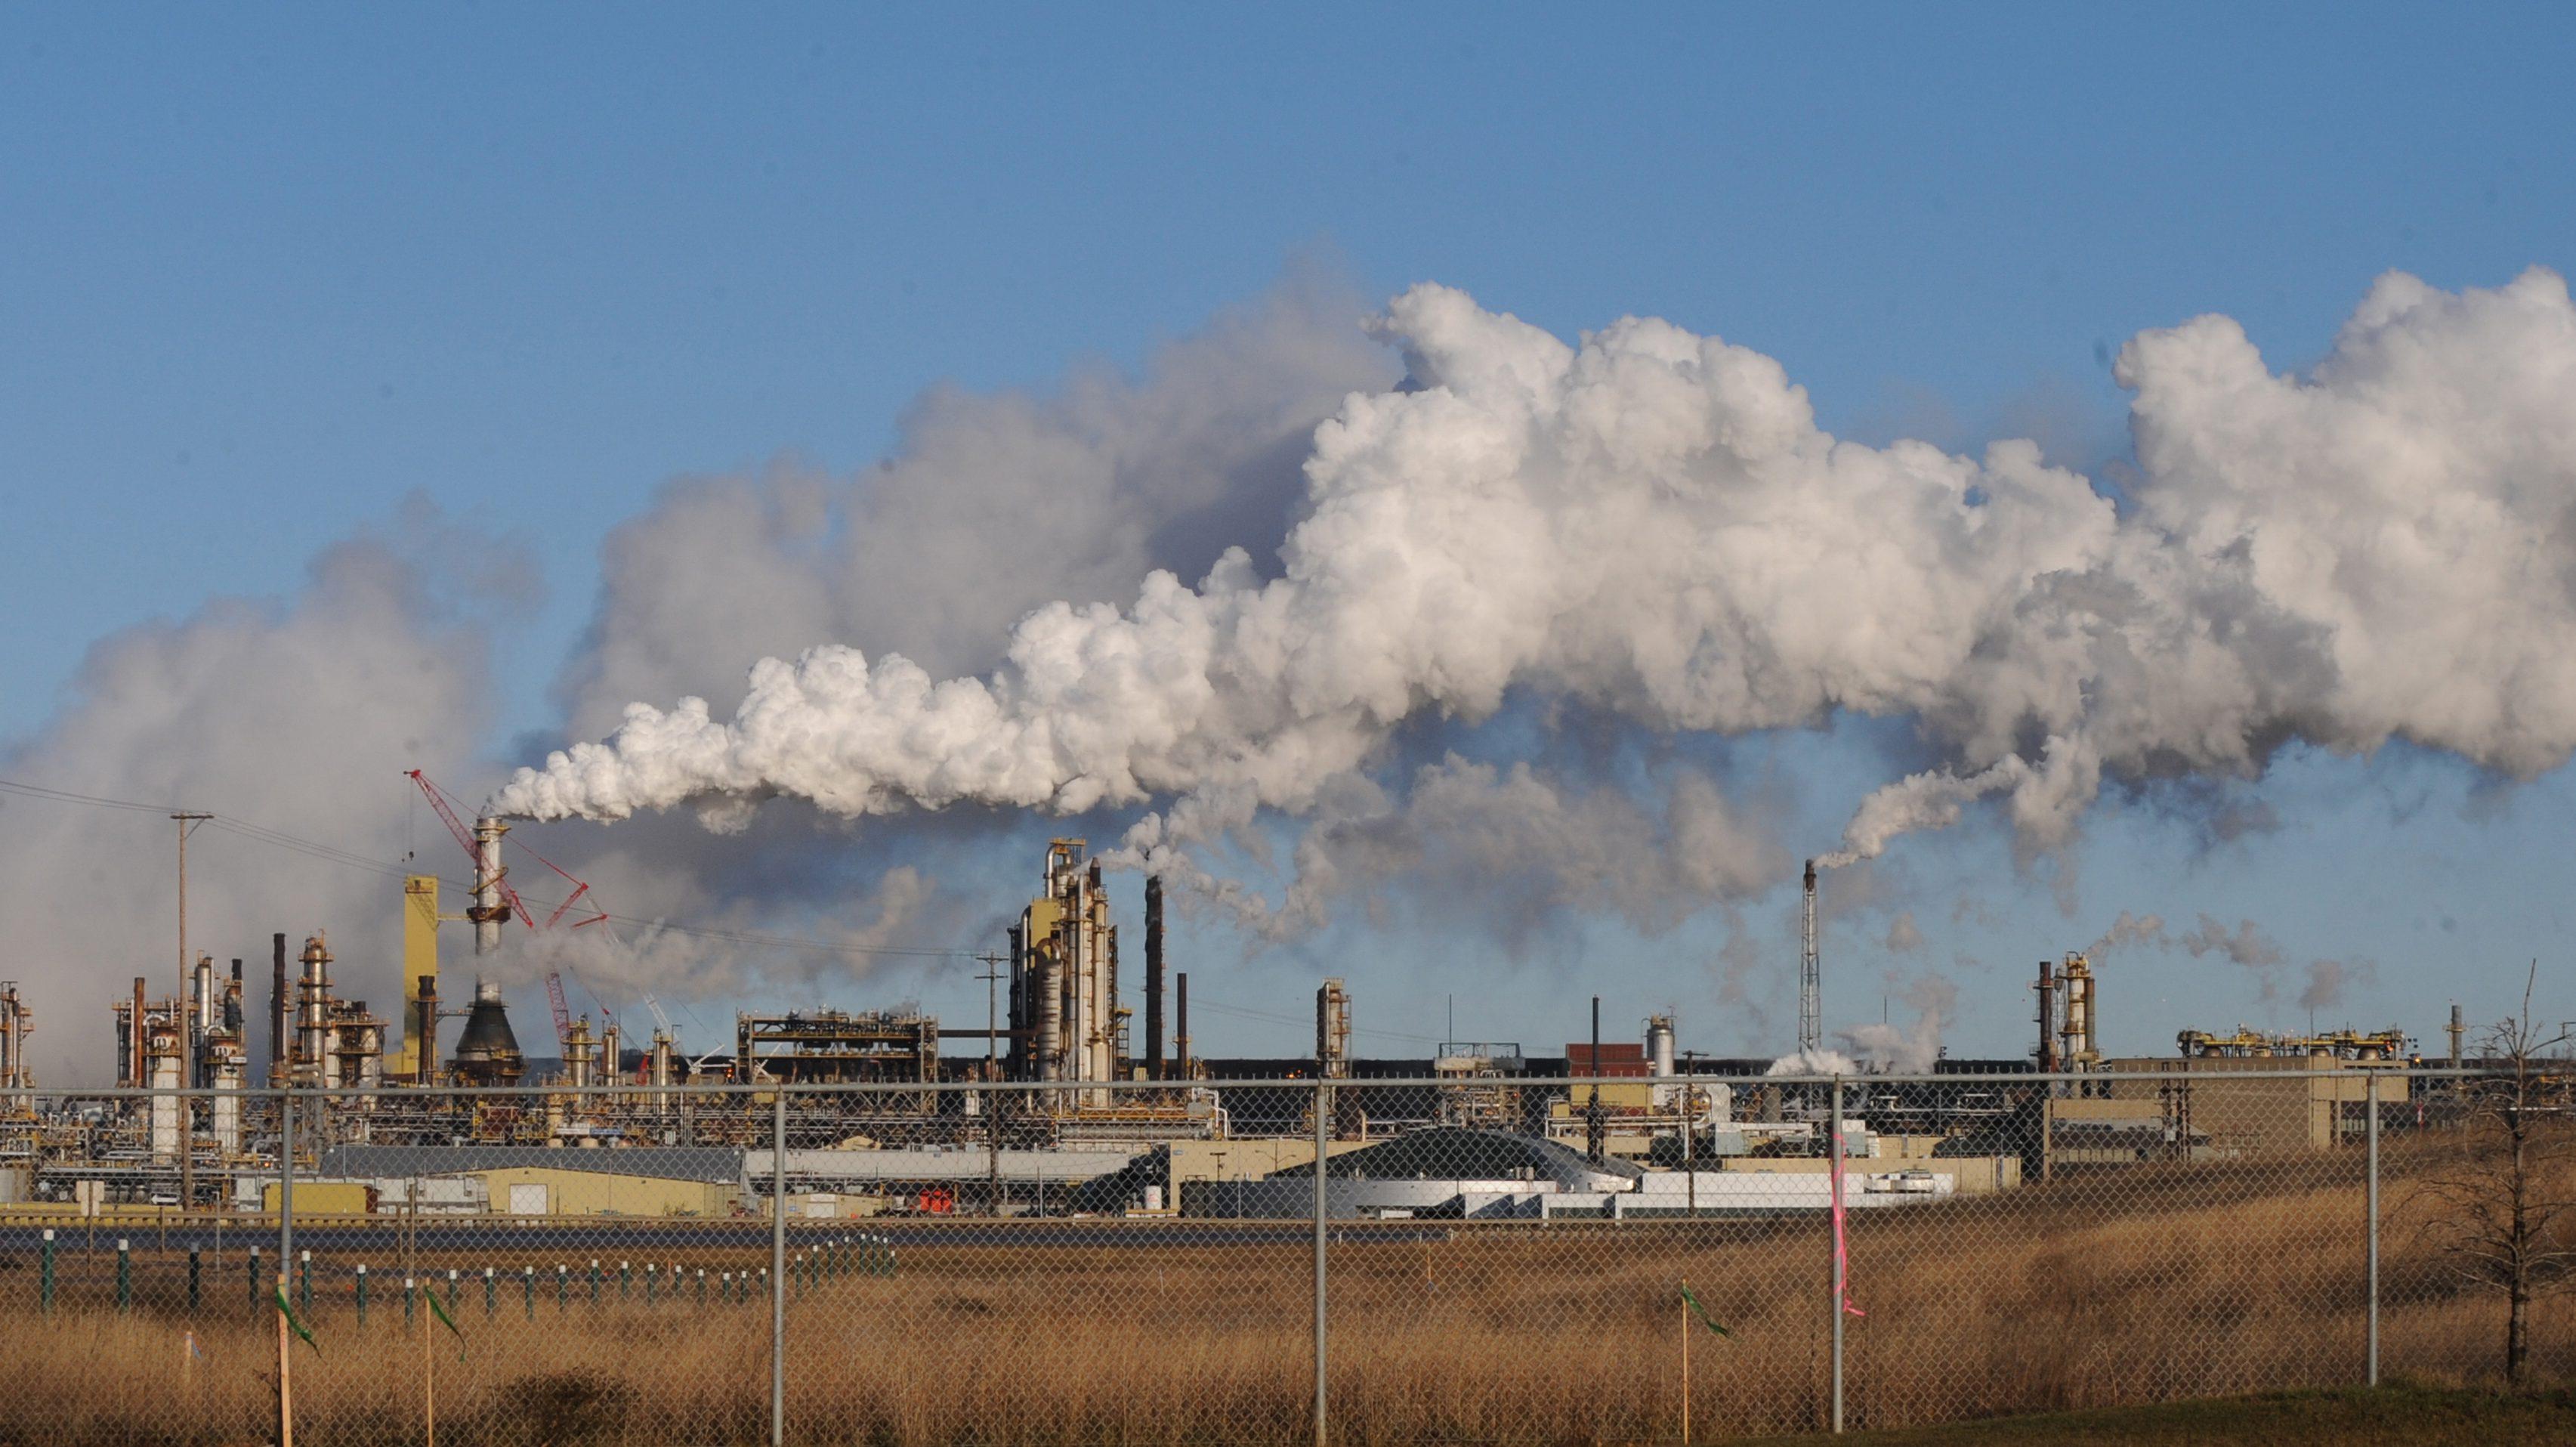 Syncrude oil sand extraction facility Alberta, Canada